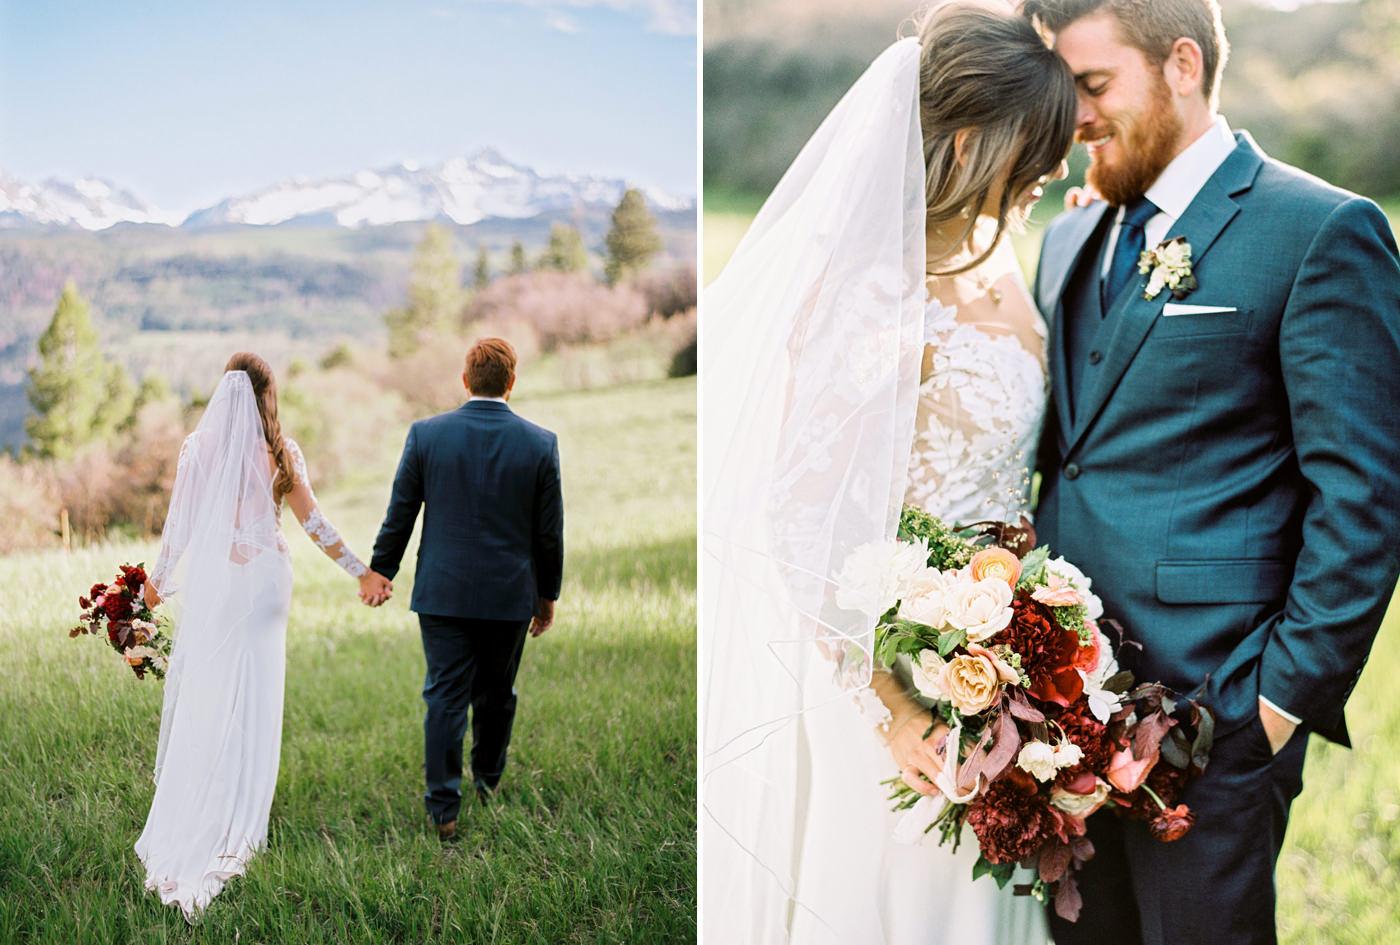 004-outdoor-telluride-wedding-by-best-colorado-film-photographer.jpg